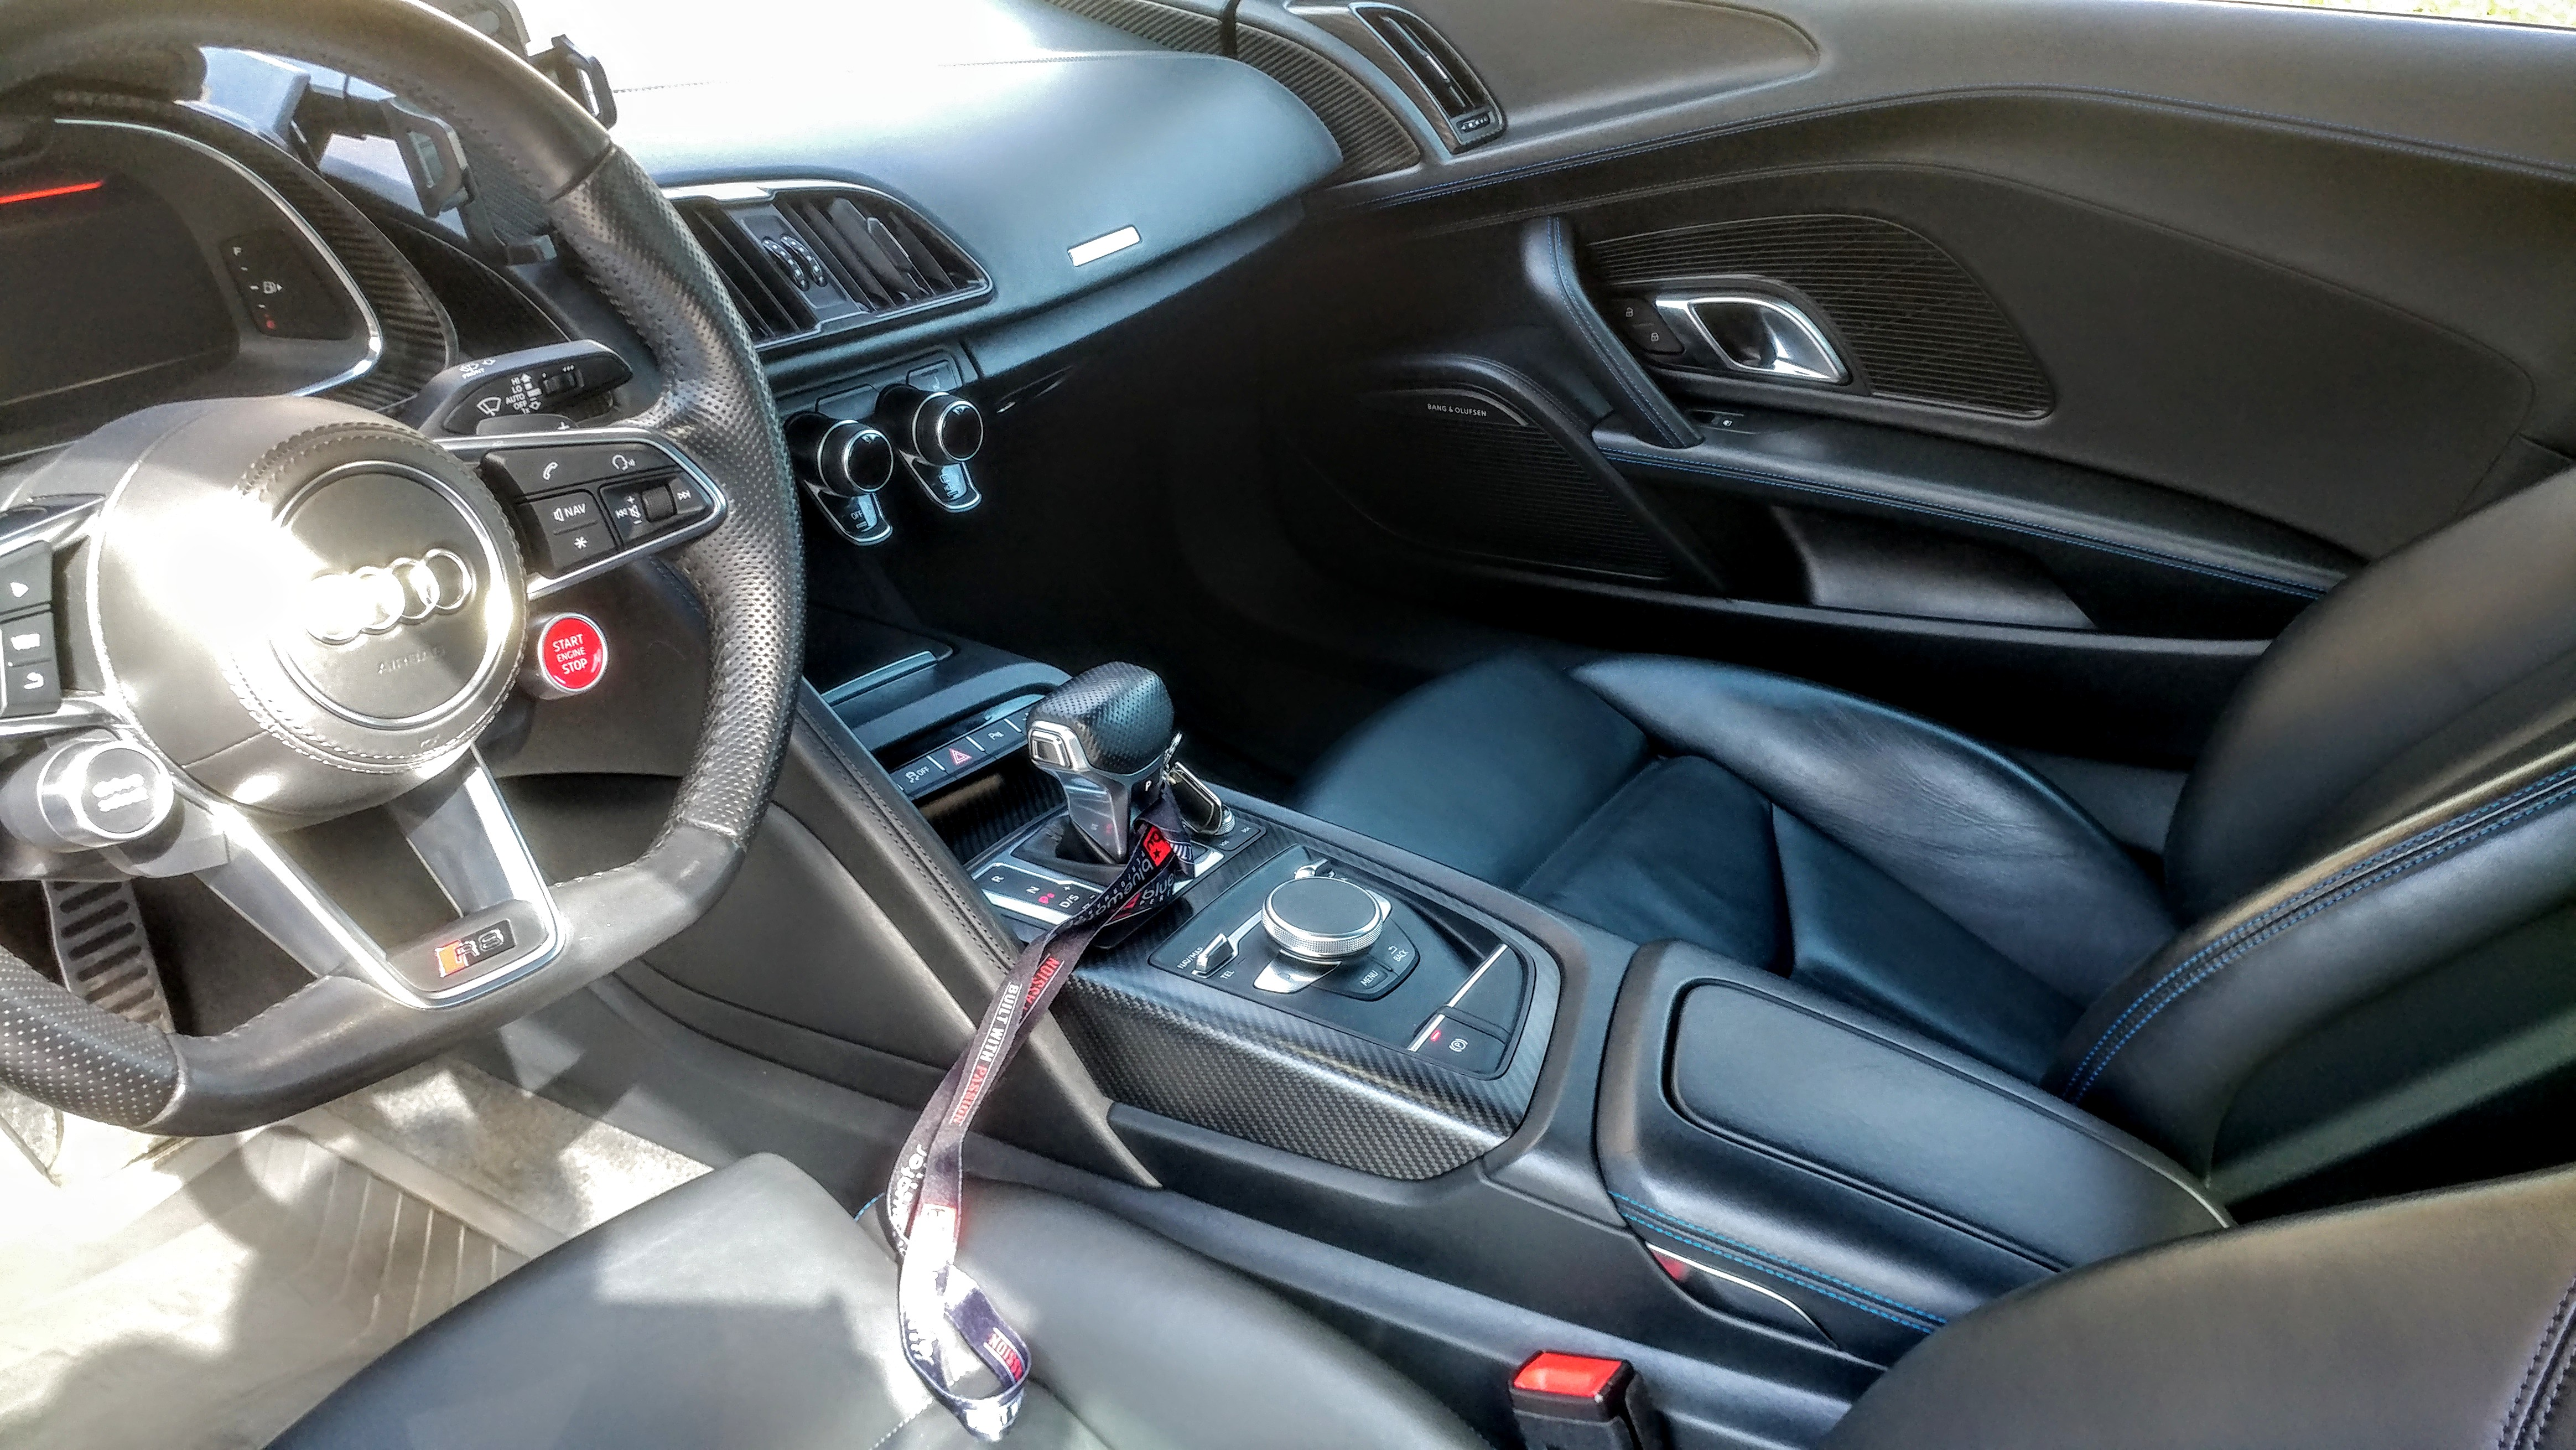 Audi R8 Interior Detail